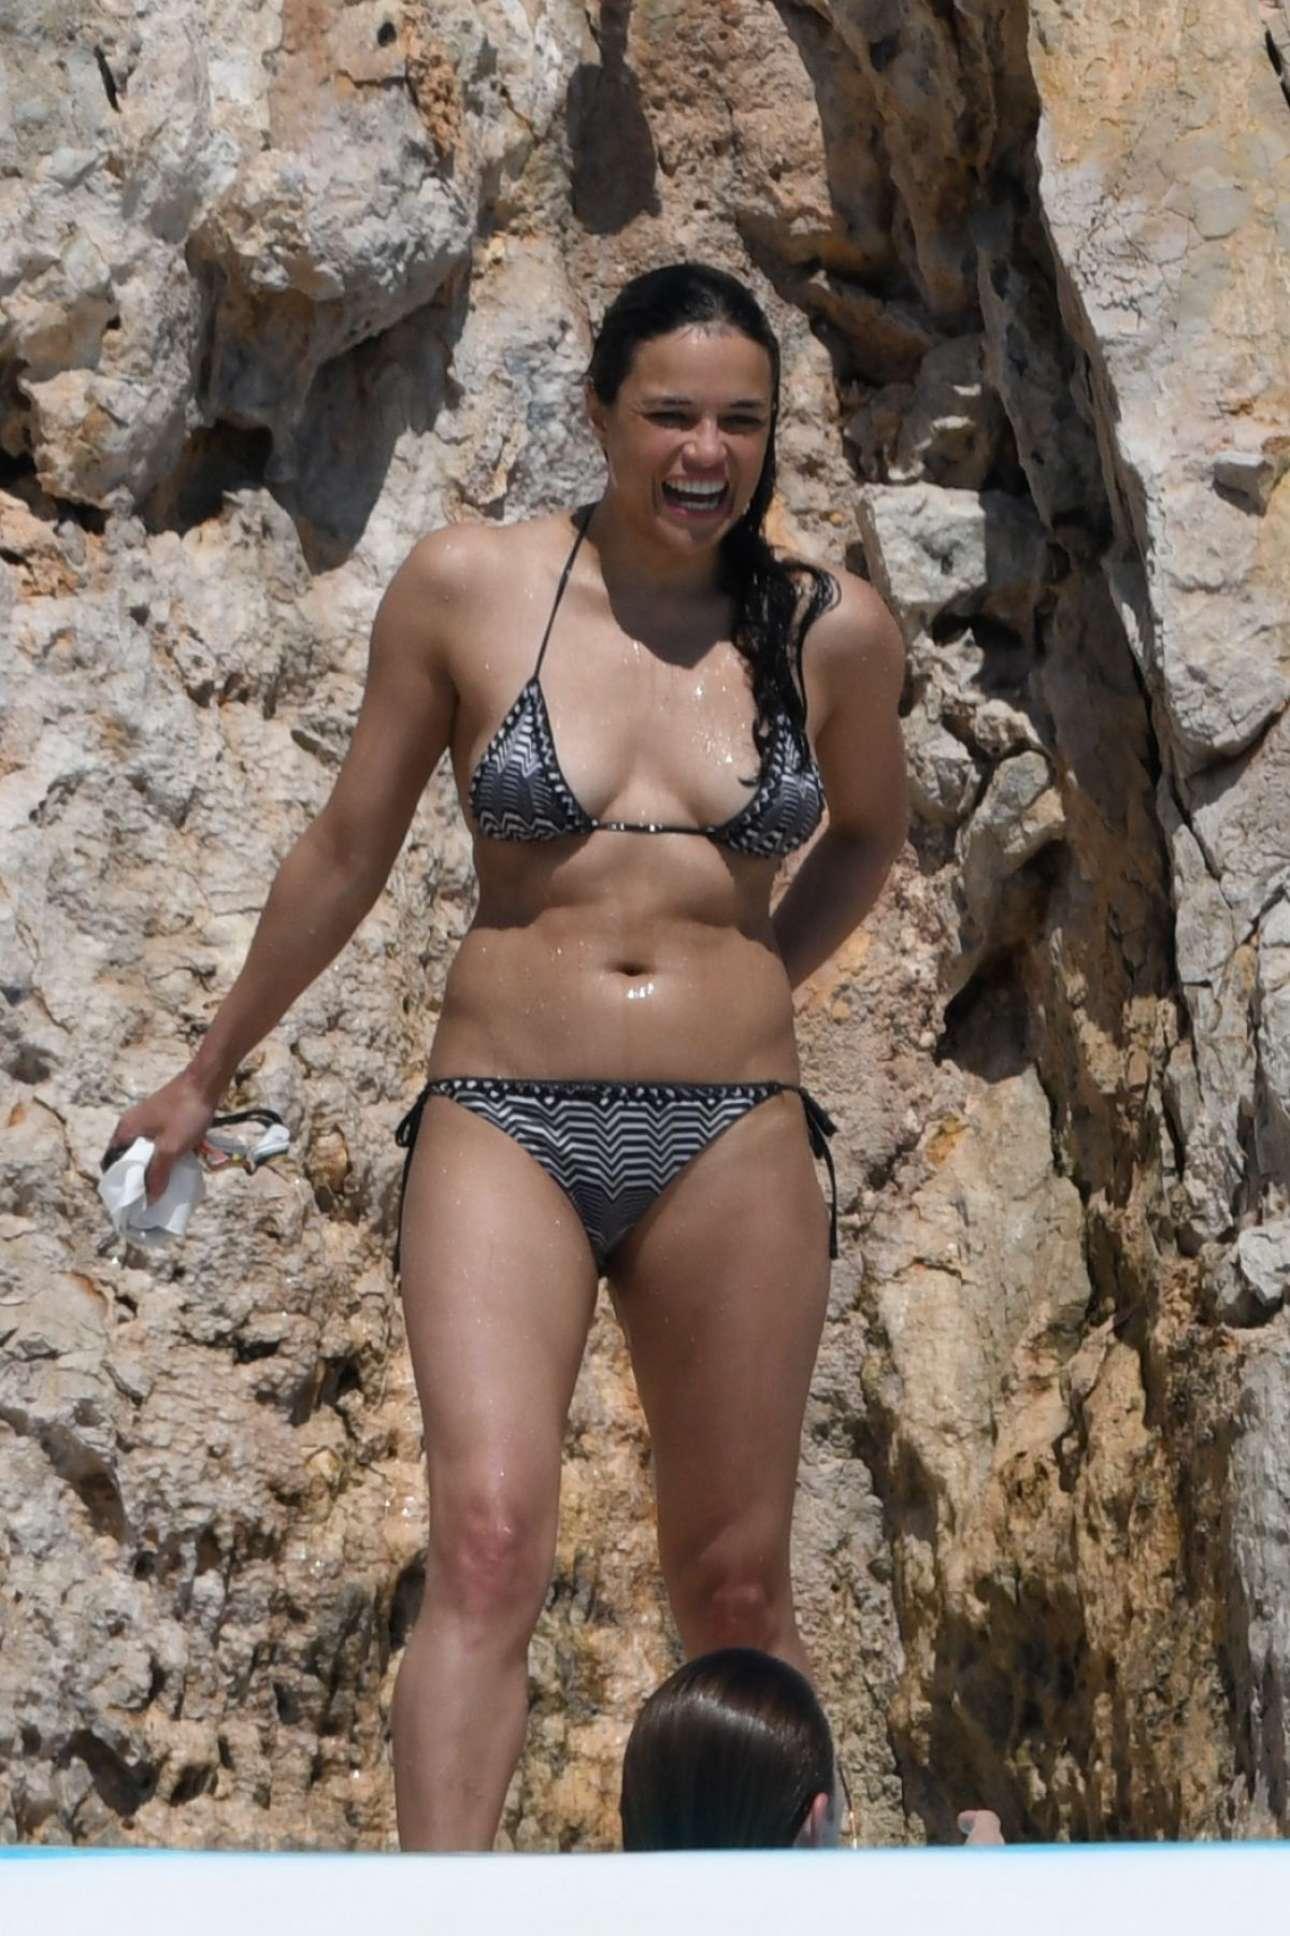 Bikini Emilia Rodriguez nude (66 foto and video), Ass, Hot, Feet, underwear 2018